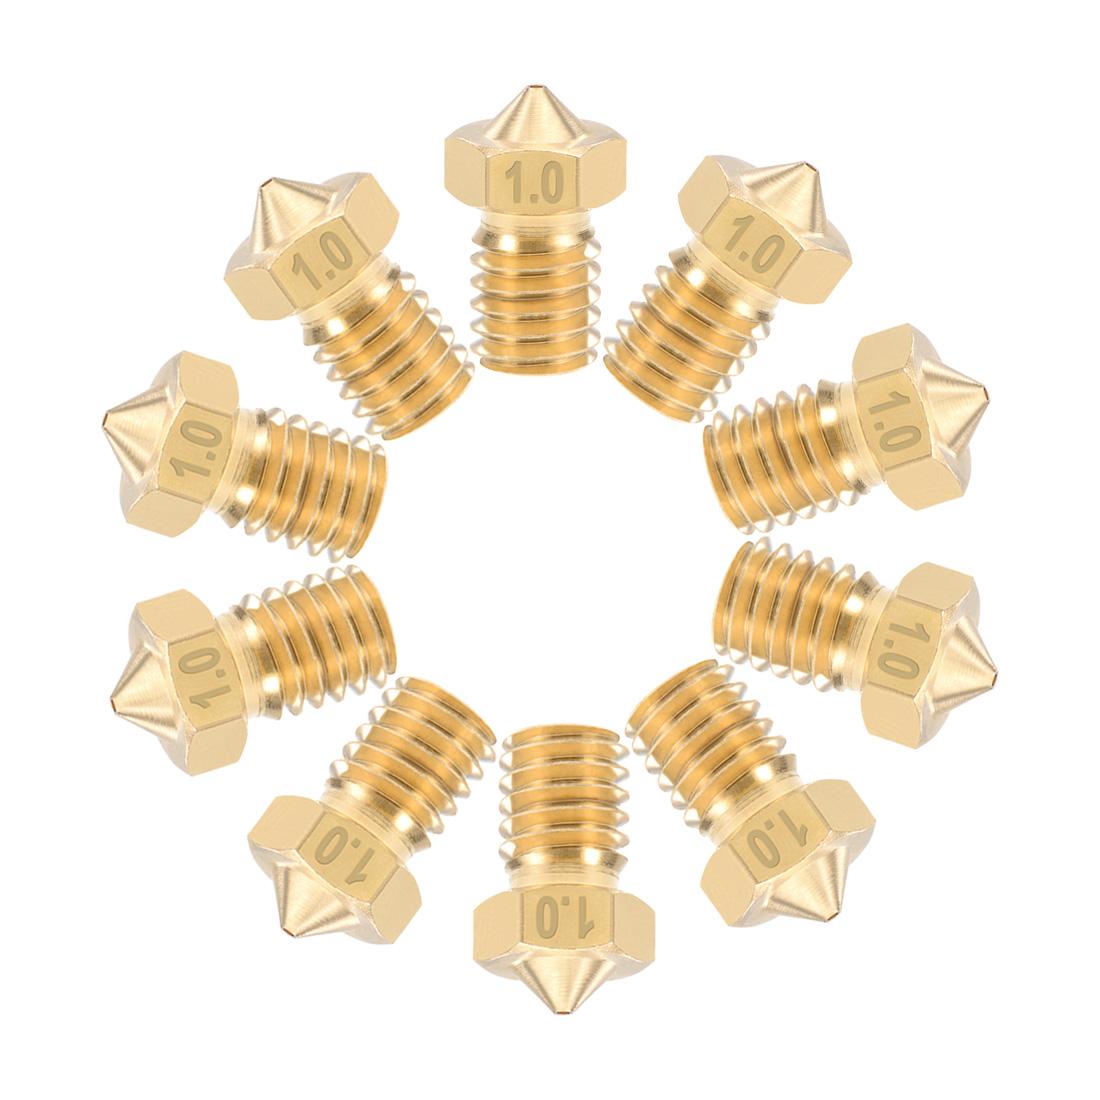 1mm 3D Printer Nozzle M6 Thread V5 V6 1.75mm Extruder Print Brass, 10pcs